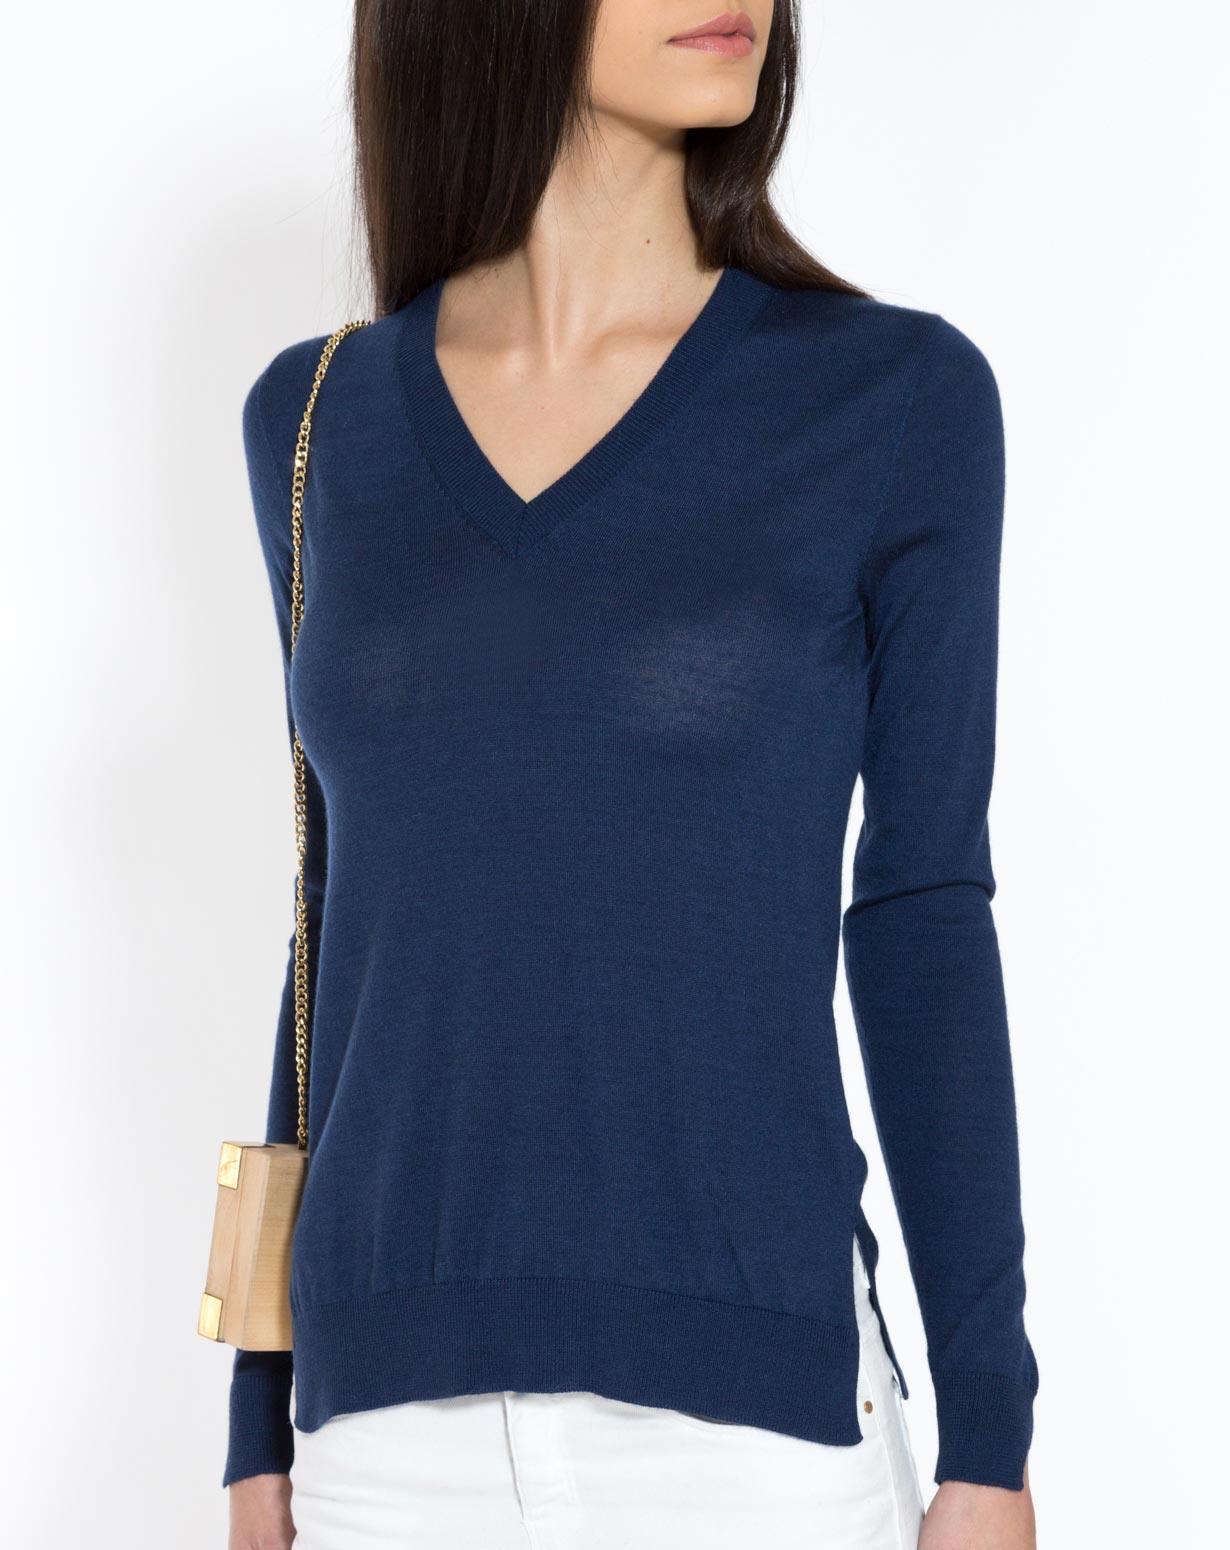 Ladies' Silk Cashmere V-Neck Jumper